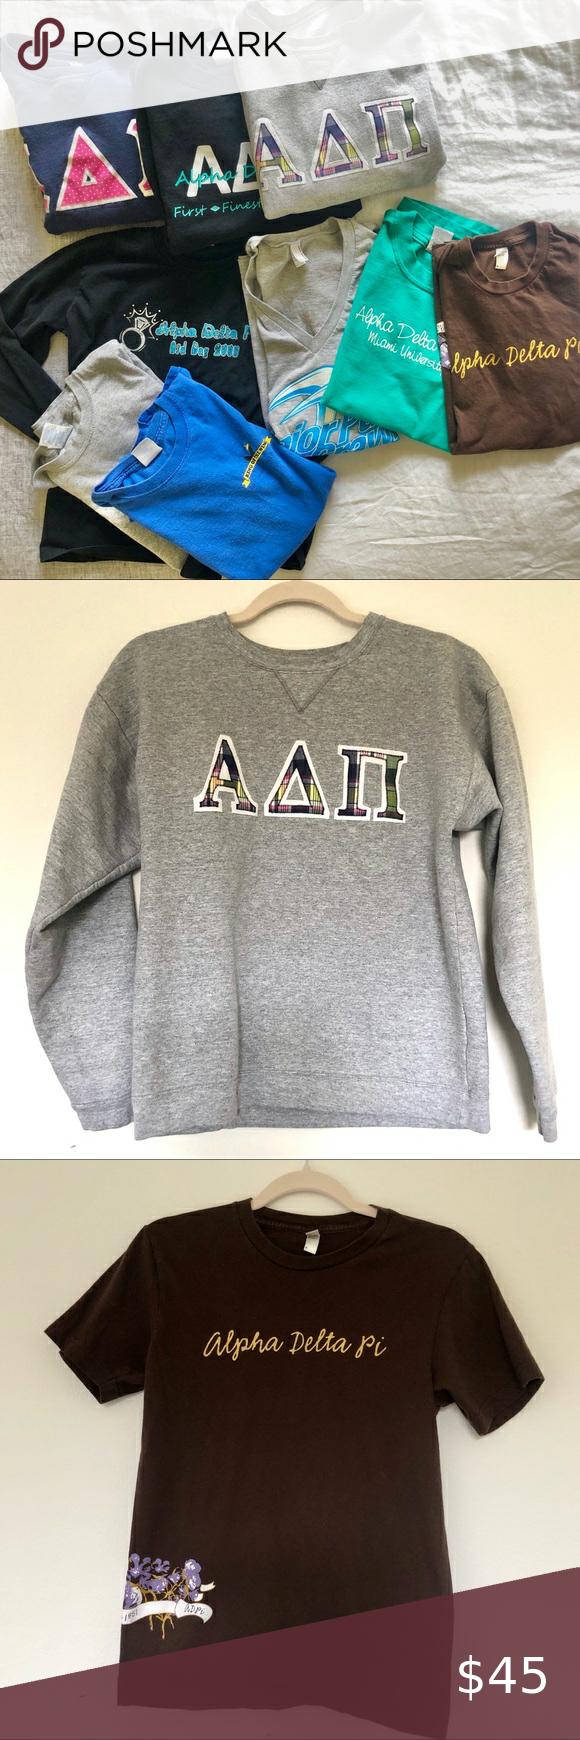 Flash Sale 45 Adpi Miami University Vintage American Apparel Tops Sweatshirts Hoodie Senior Sweatshirts [ 1740 x 580 Pixel ]